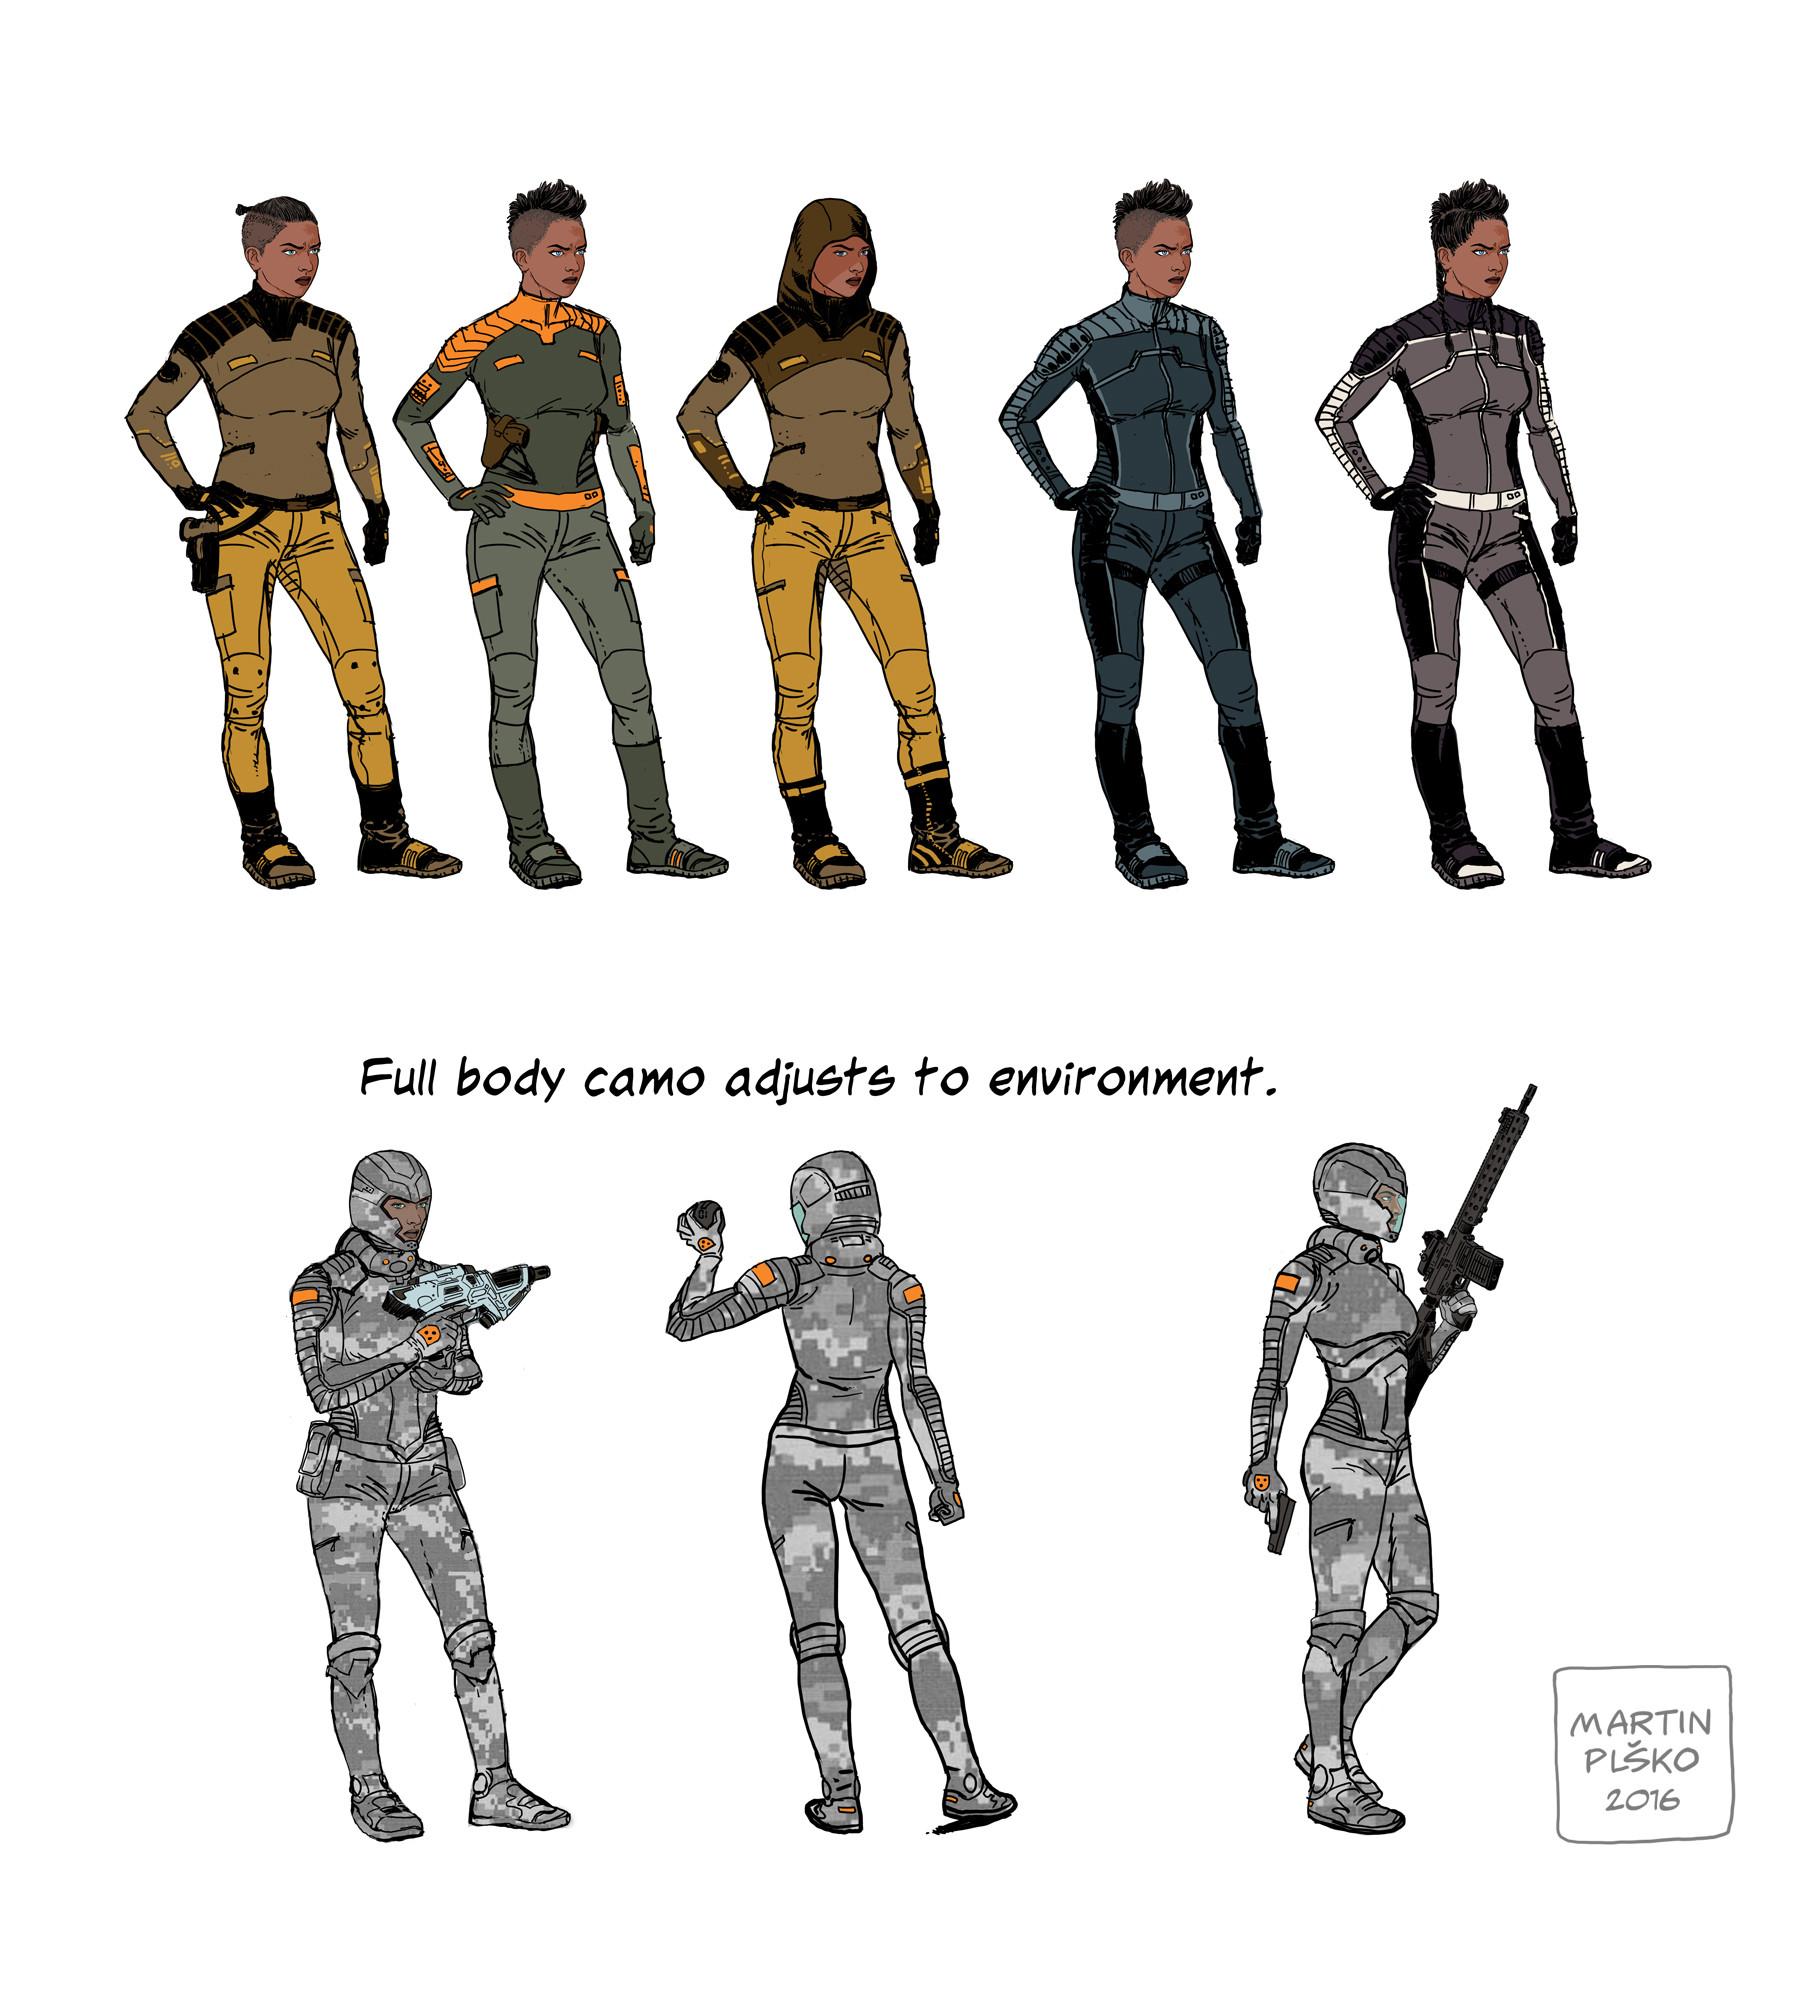 Second round of uniform designs, refining stage.